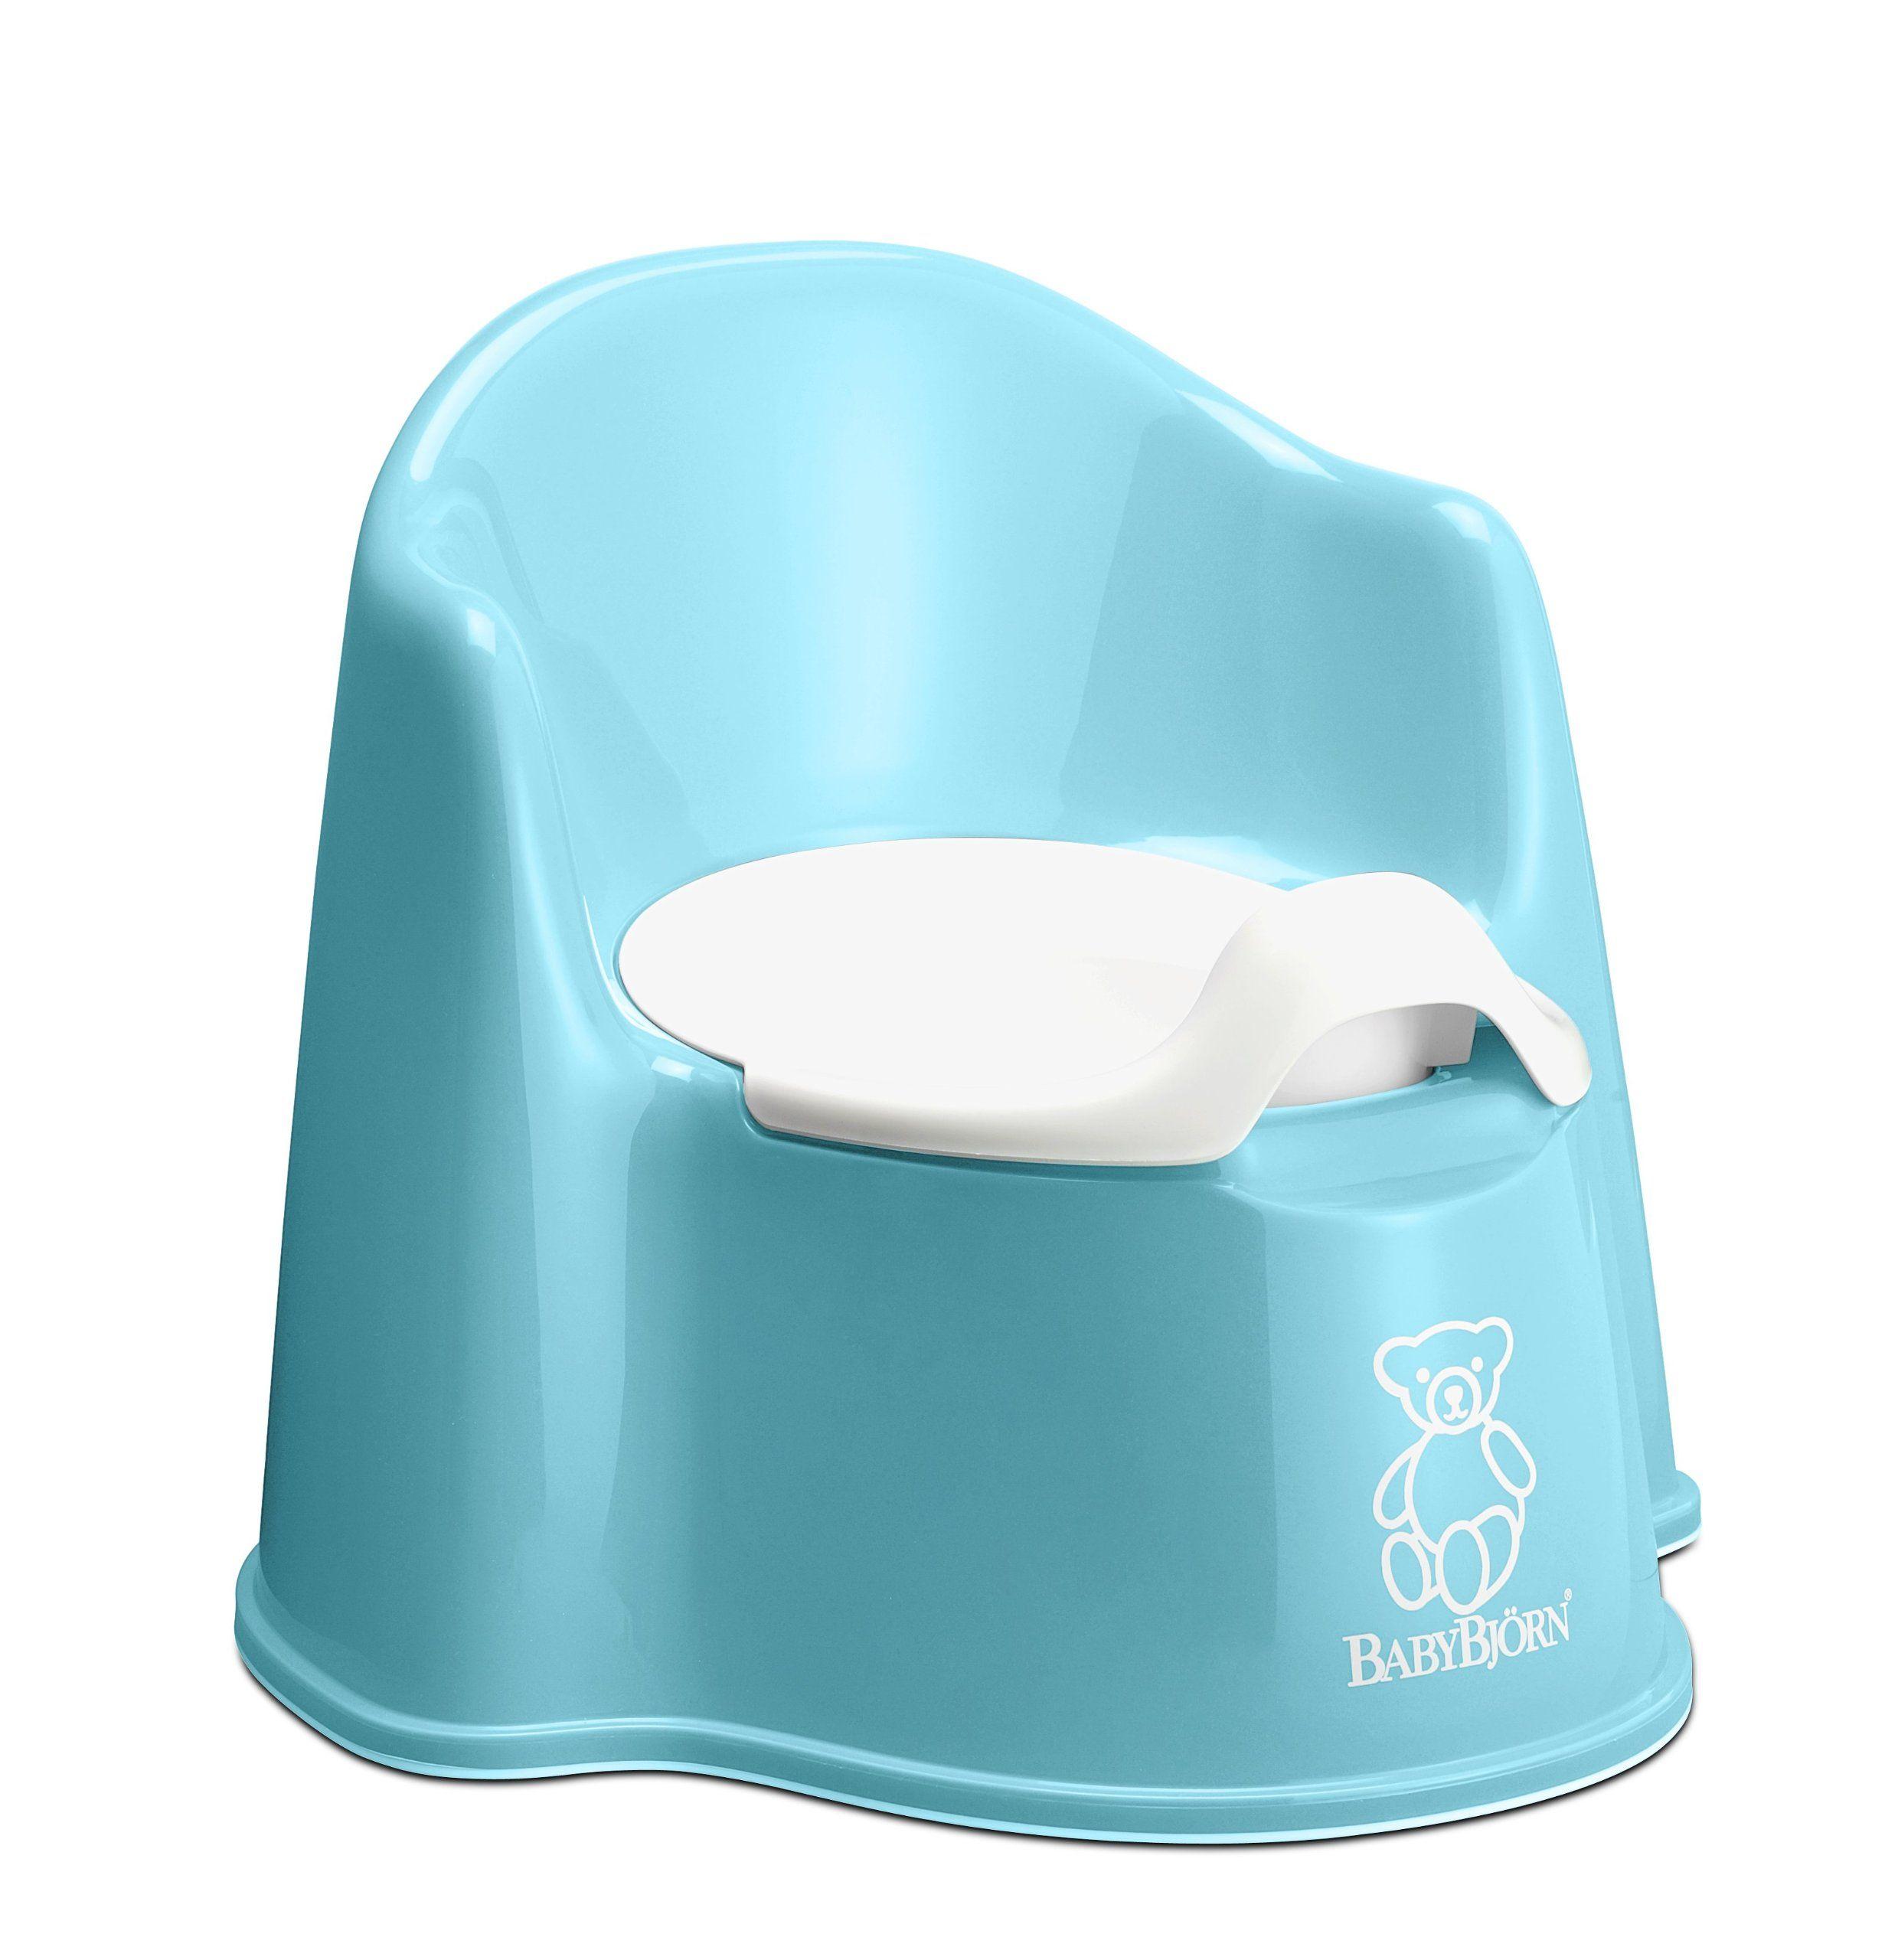 Amazon Com Babybjorn Potty Chair Blue Toilet Training Potties Baby Potty Chair Baby Bjorn Potty